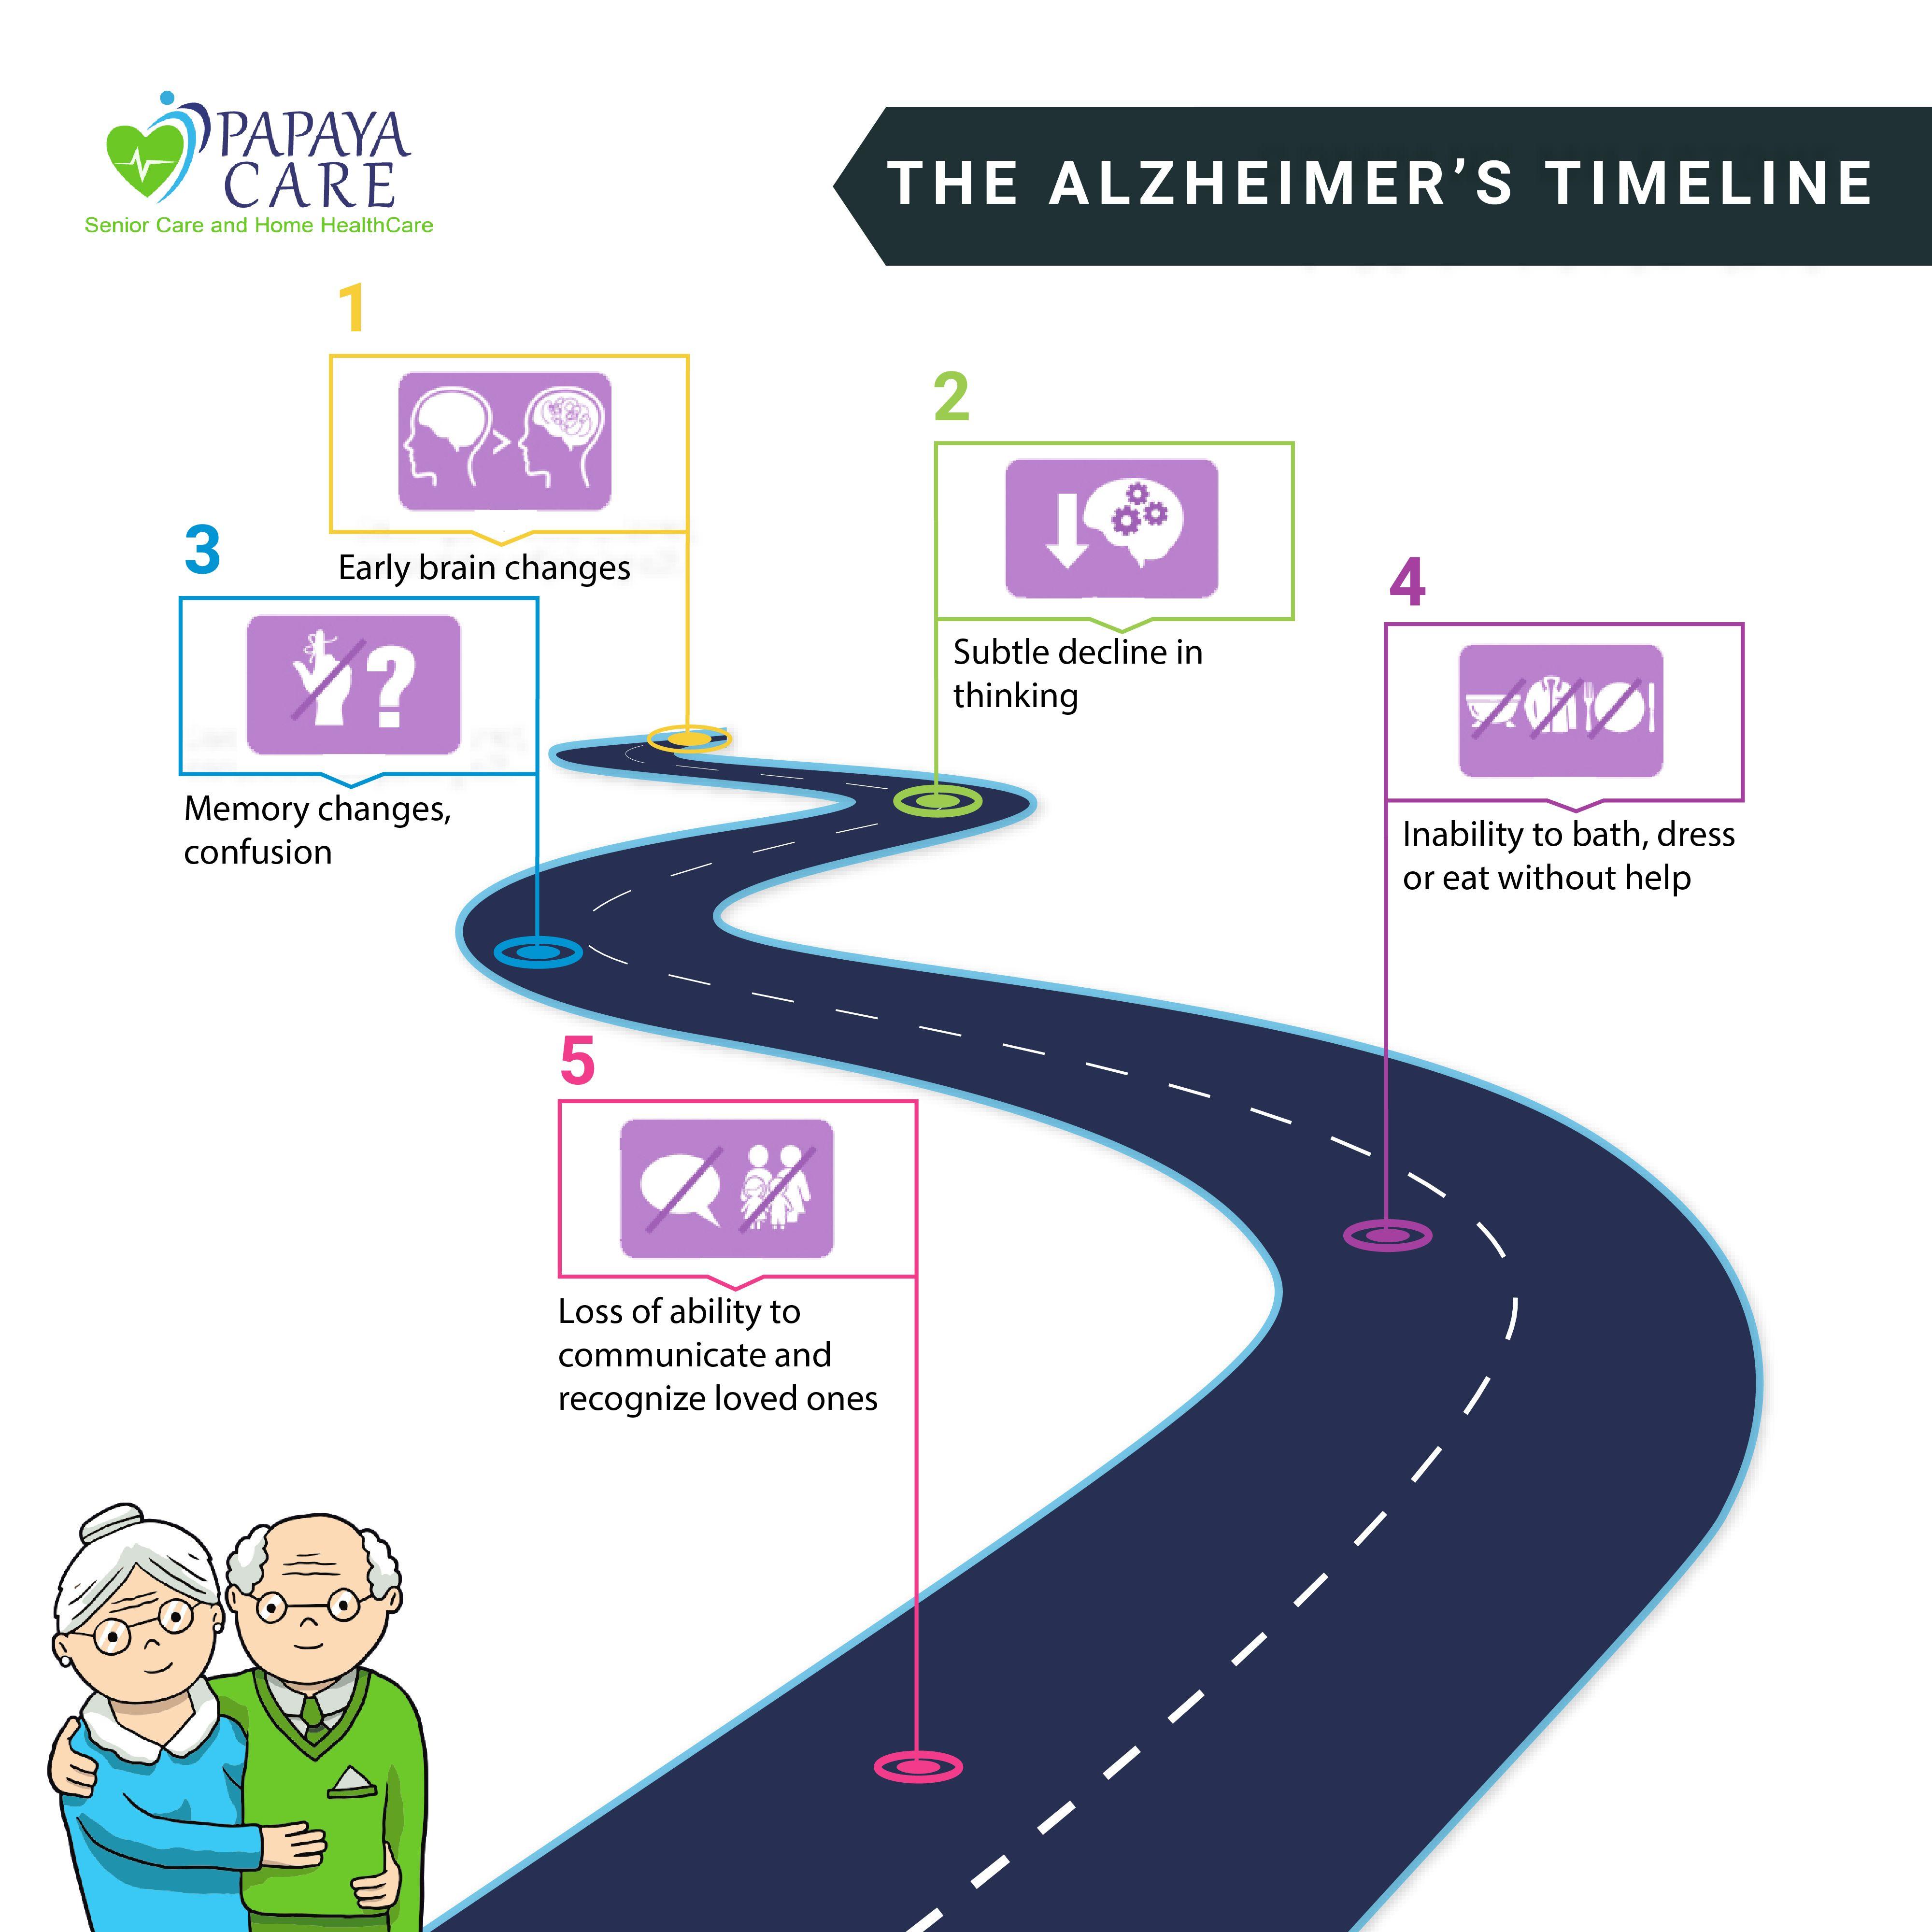 The symptoms of Alzheimer's disease progresses over time